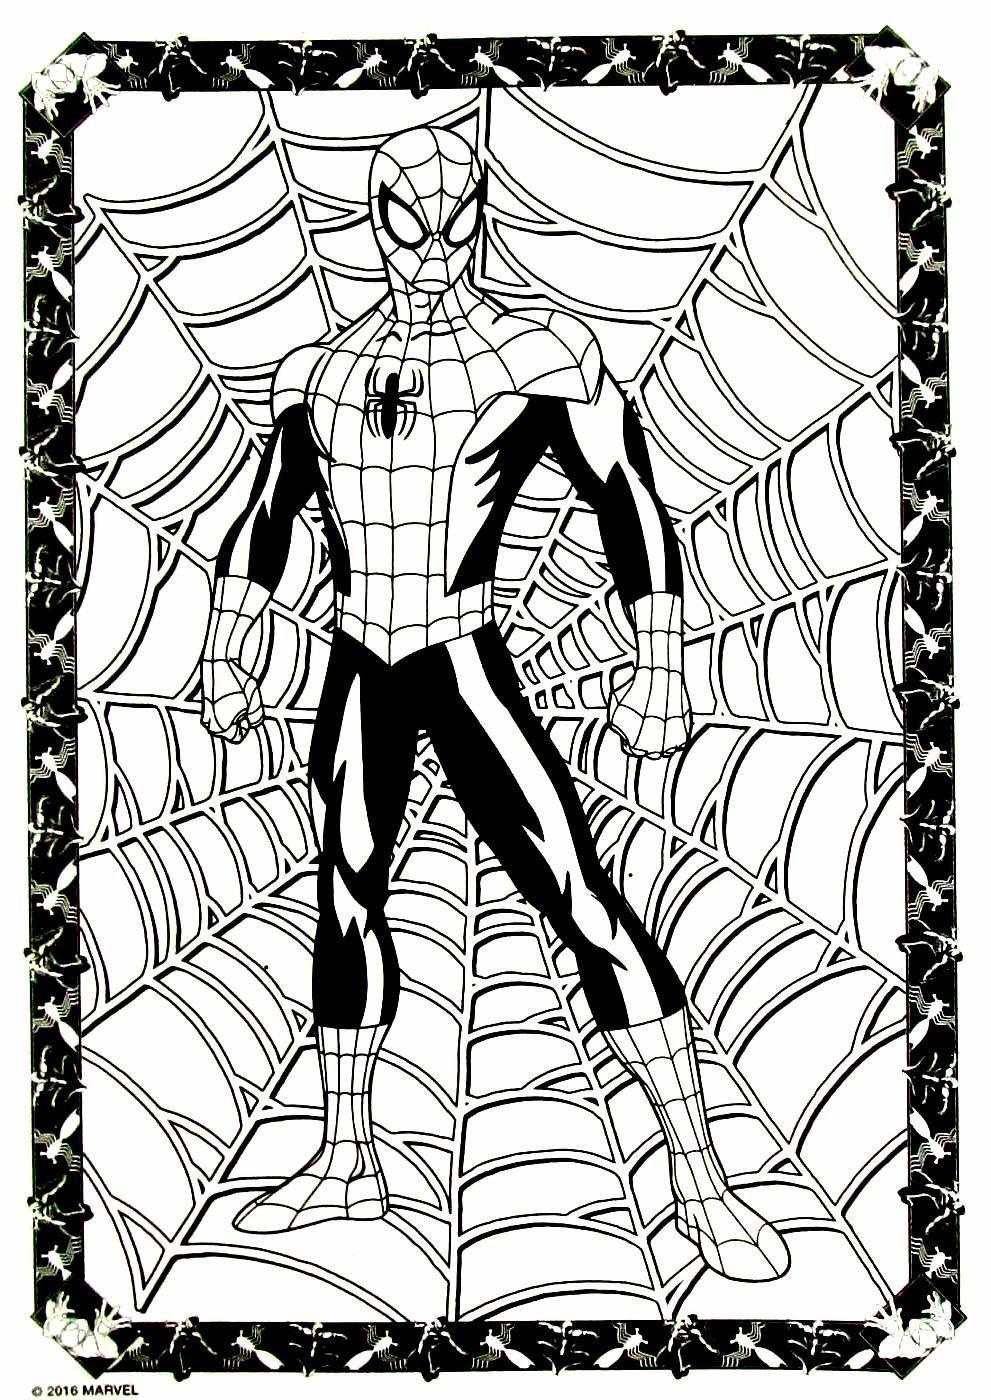 Spiderman Coloring Book Page Spiderman Coloring Superhero Sketches Coloring Book Art